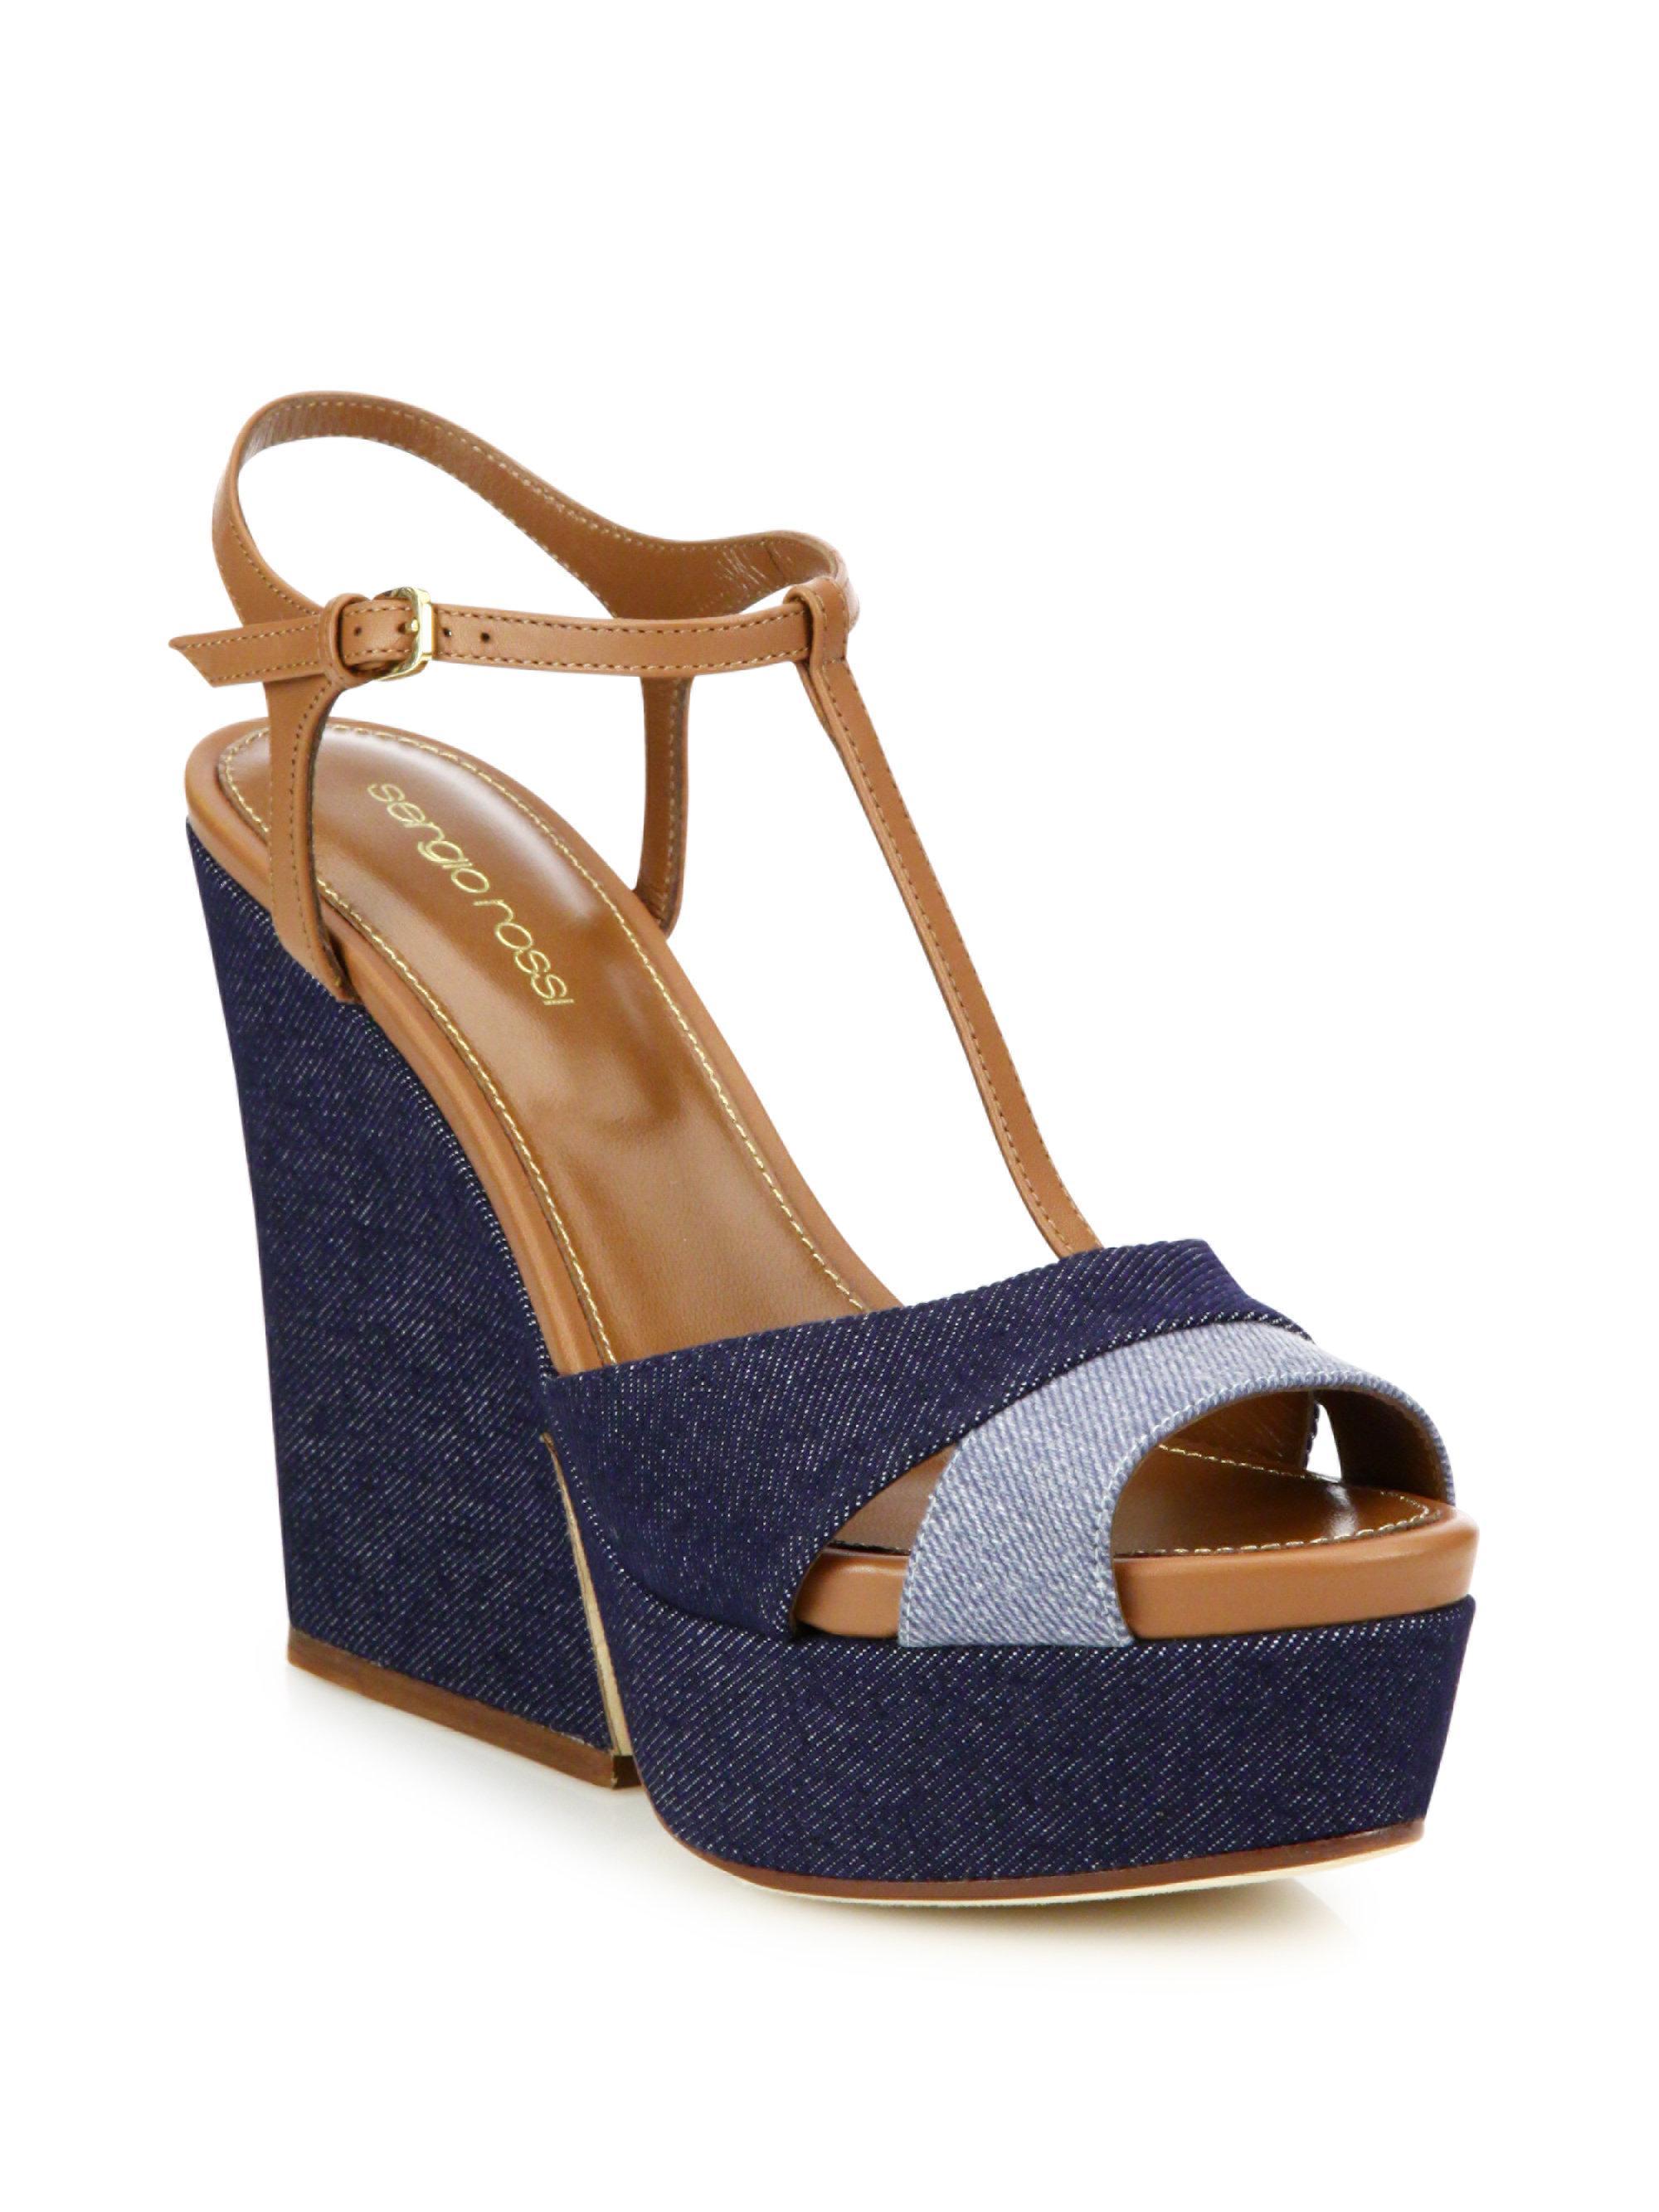 Lyst Sergio Rossi Edwige Denim T Strap Wedge Sandal In Blue